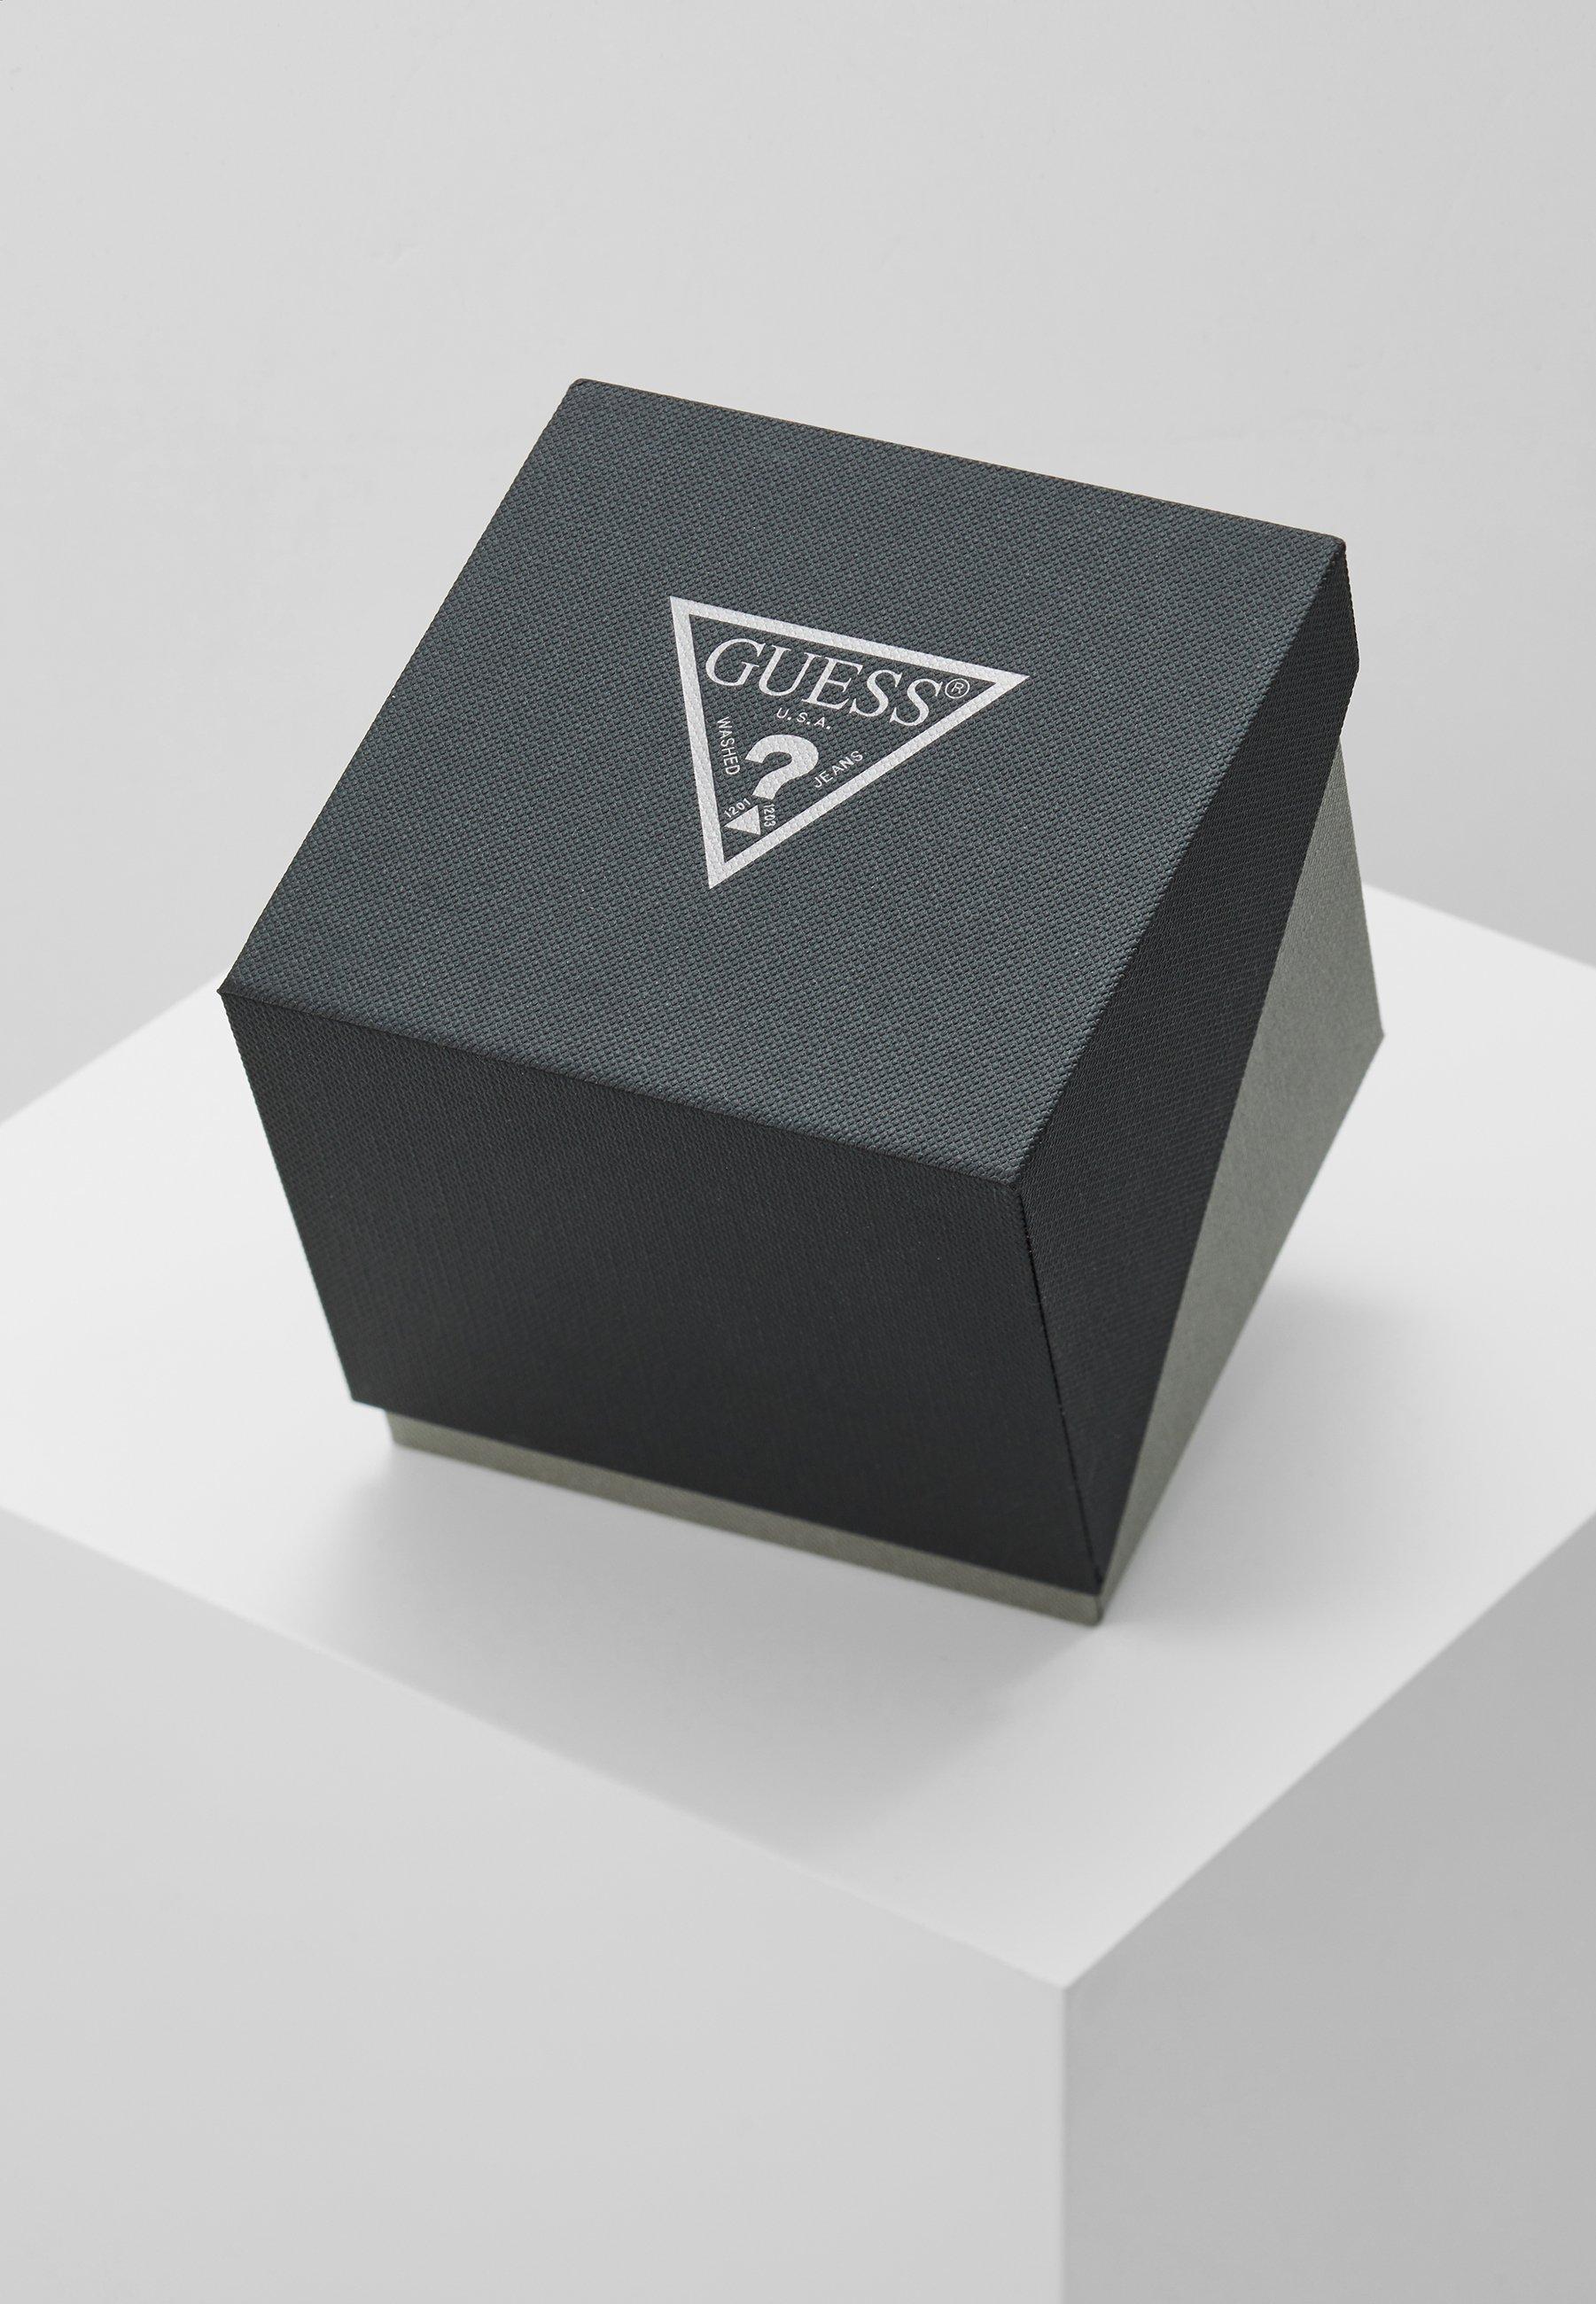 Guess Kronografklokke - black/svart daGysNAL1Qd4nDV